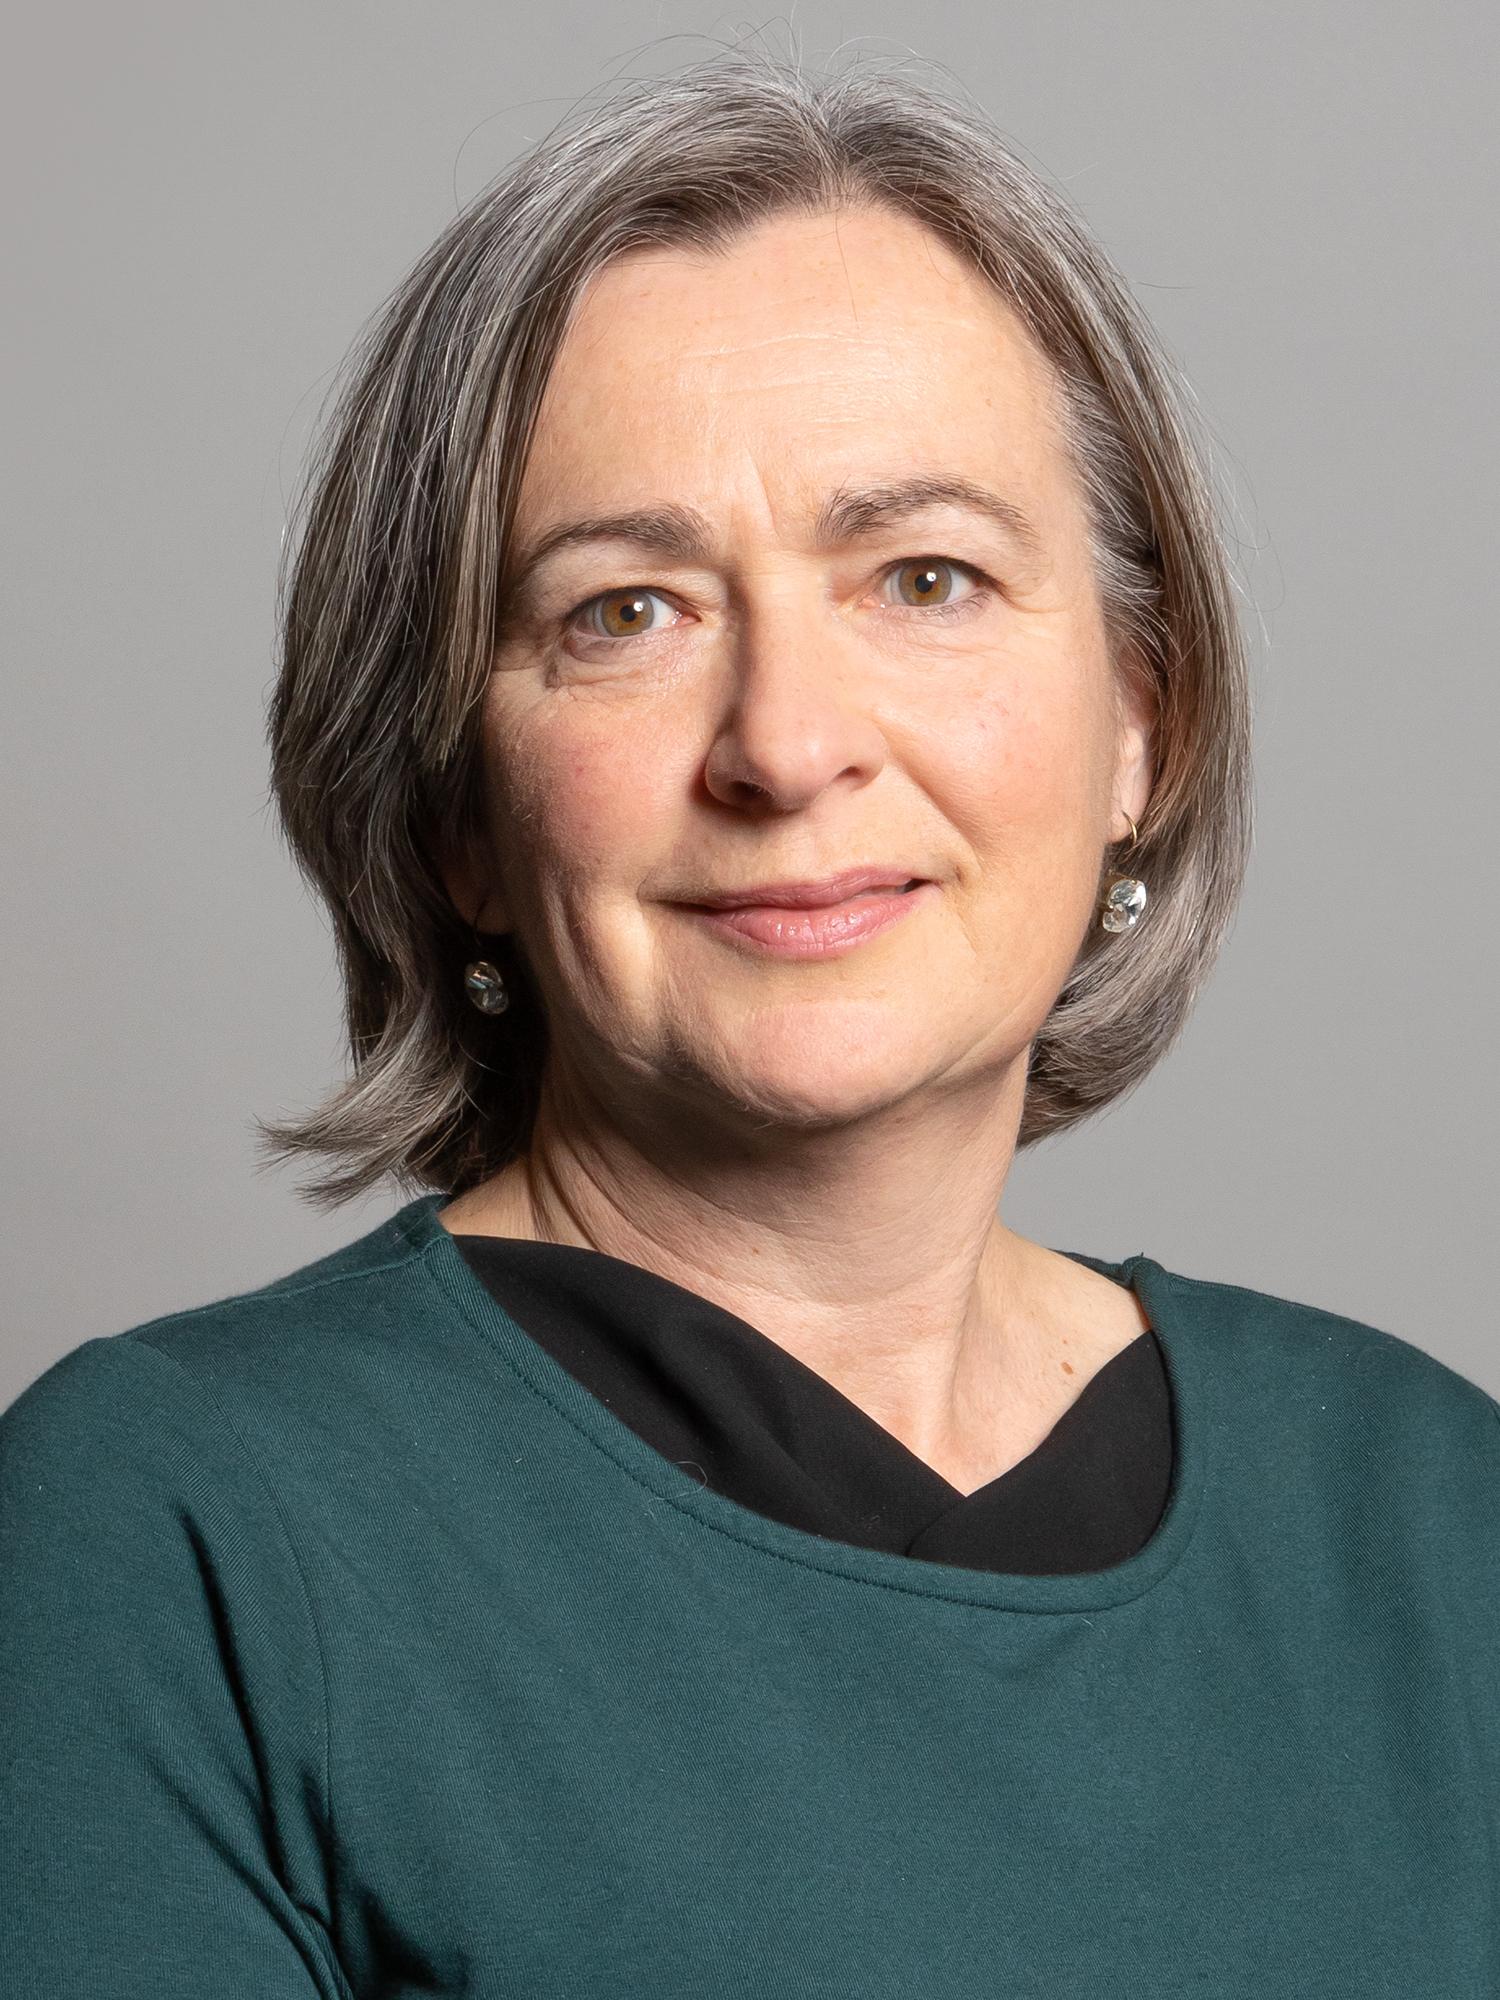 Liz Saville Roberts - Wikipedia